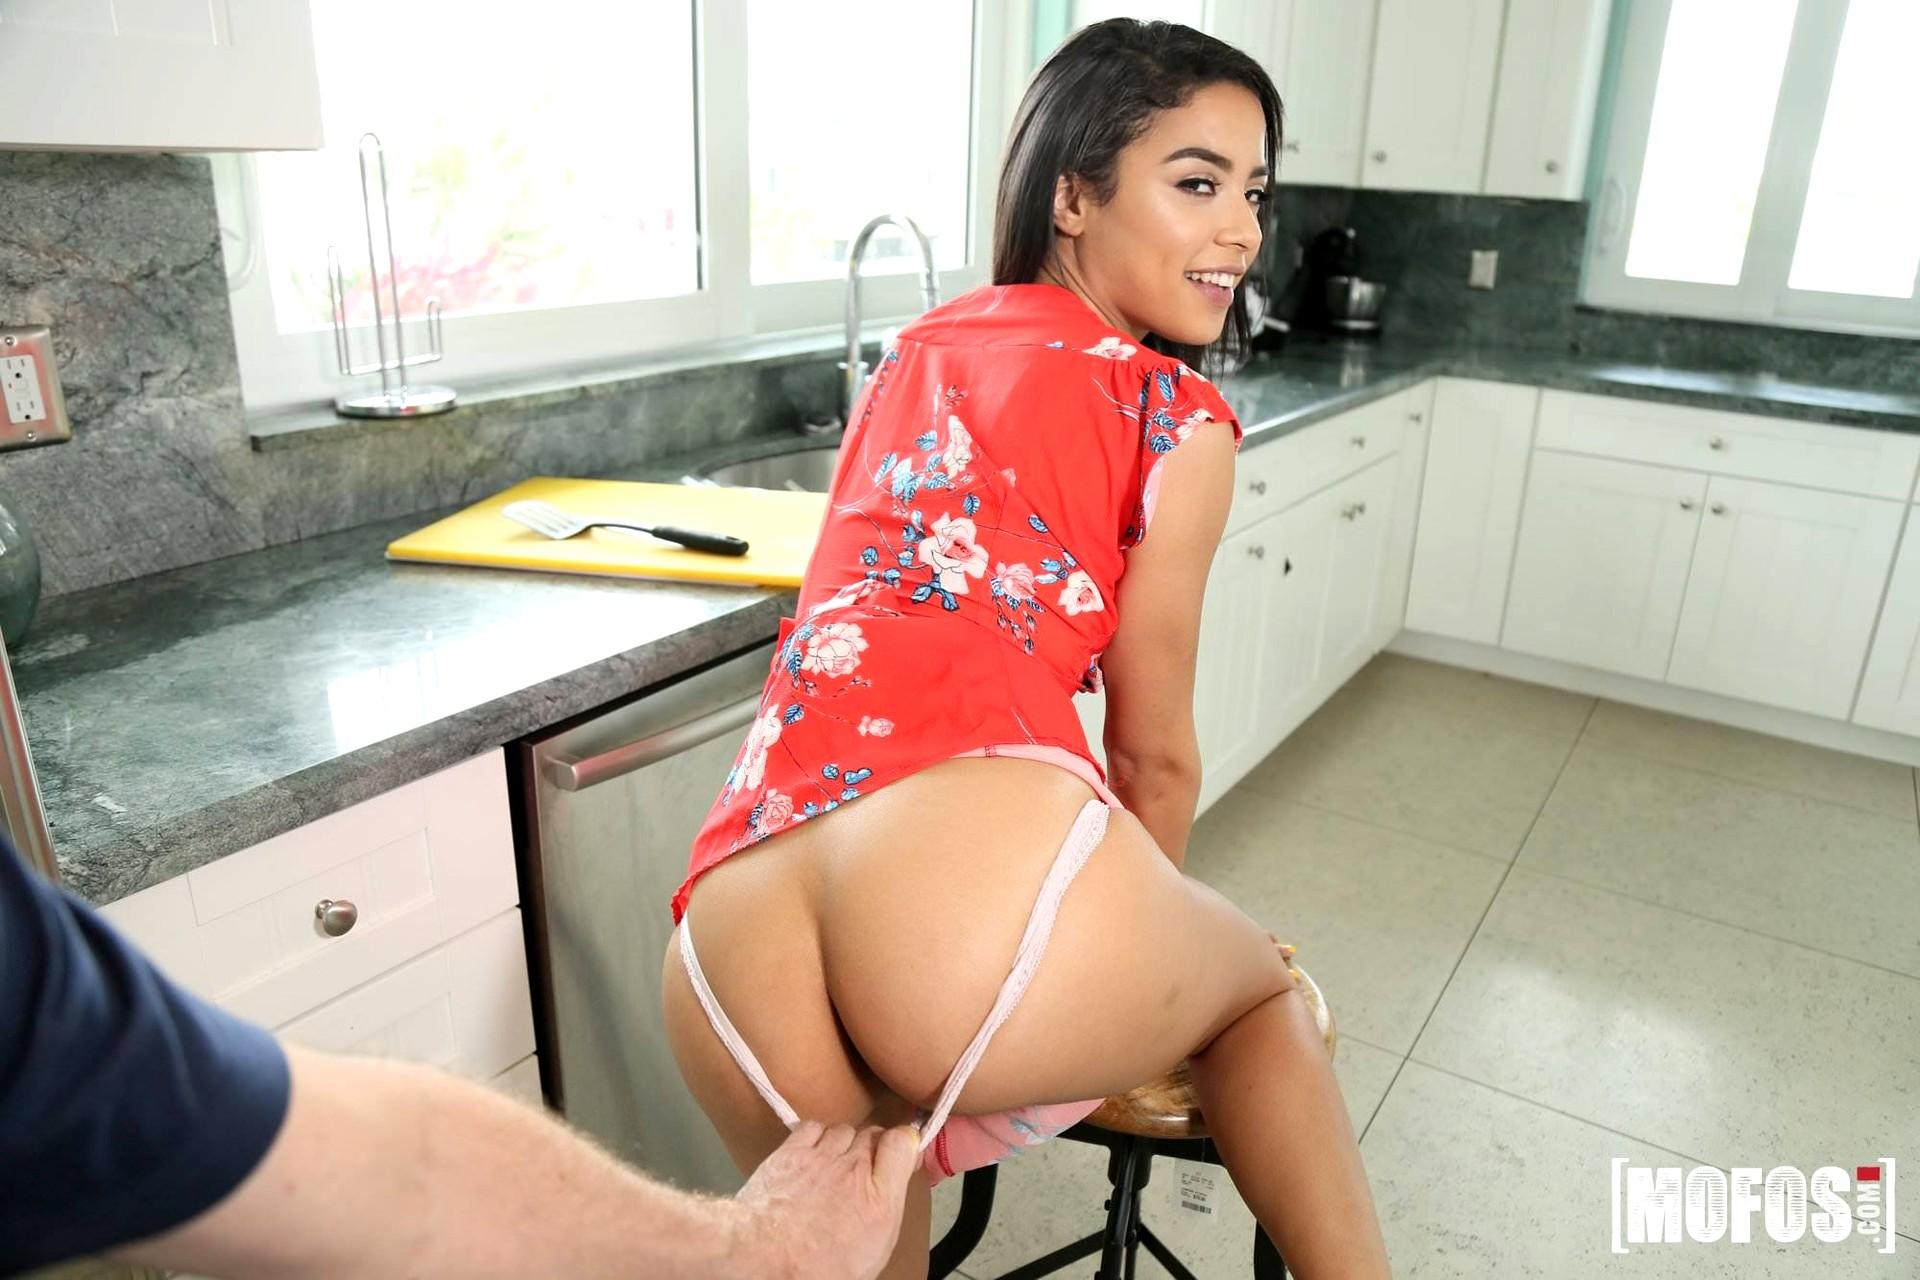 Cute Sexy Lesbian Teens Maya Bijou And Kendra Spade Enjoy Deep Ass Licking And Toying For Intense Orgasms